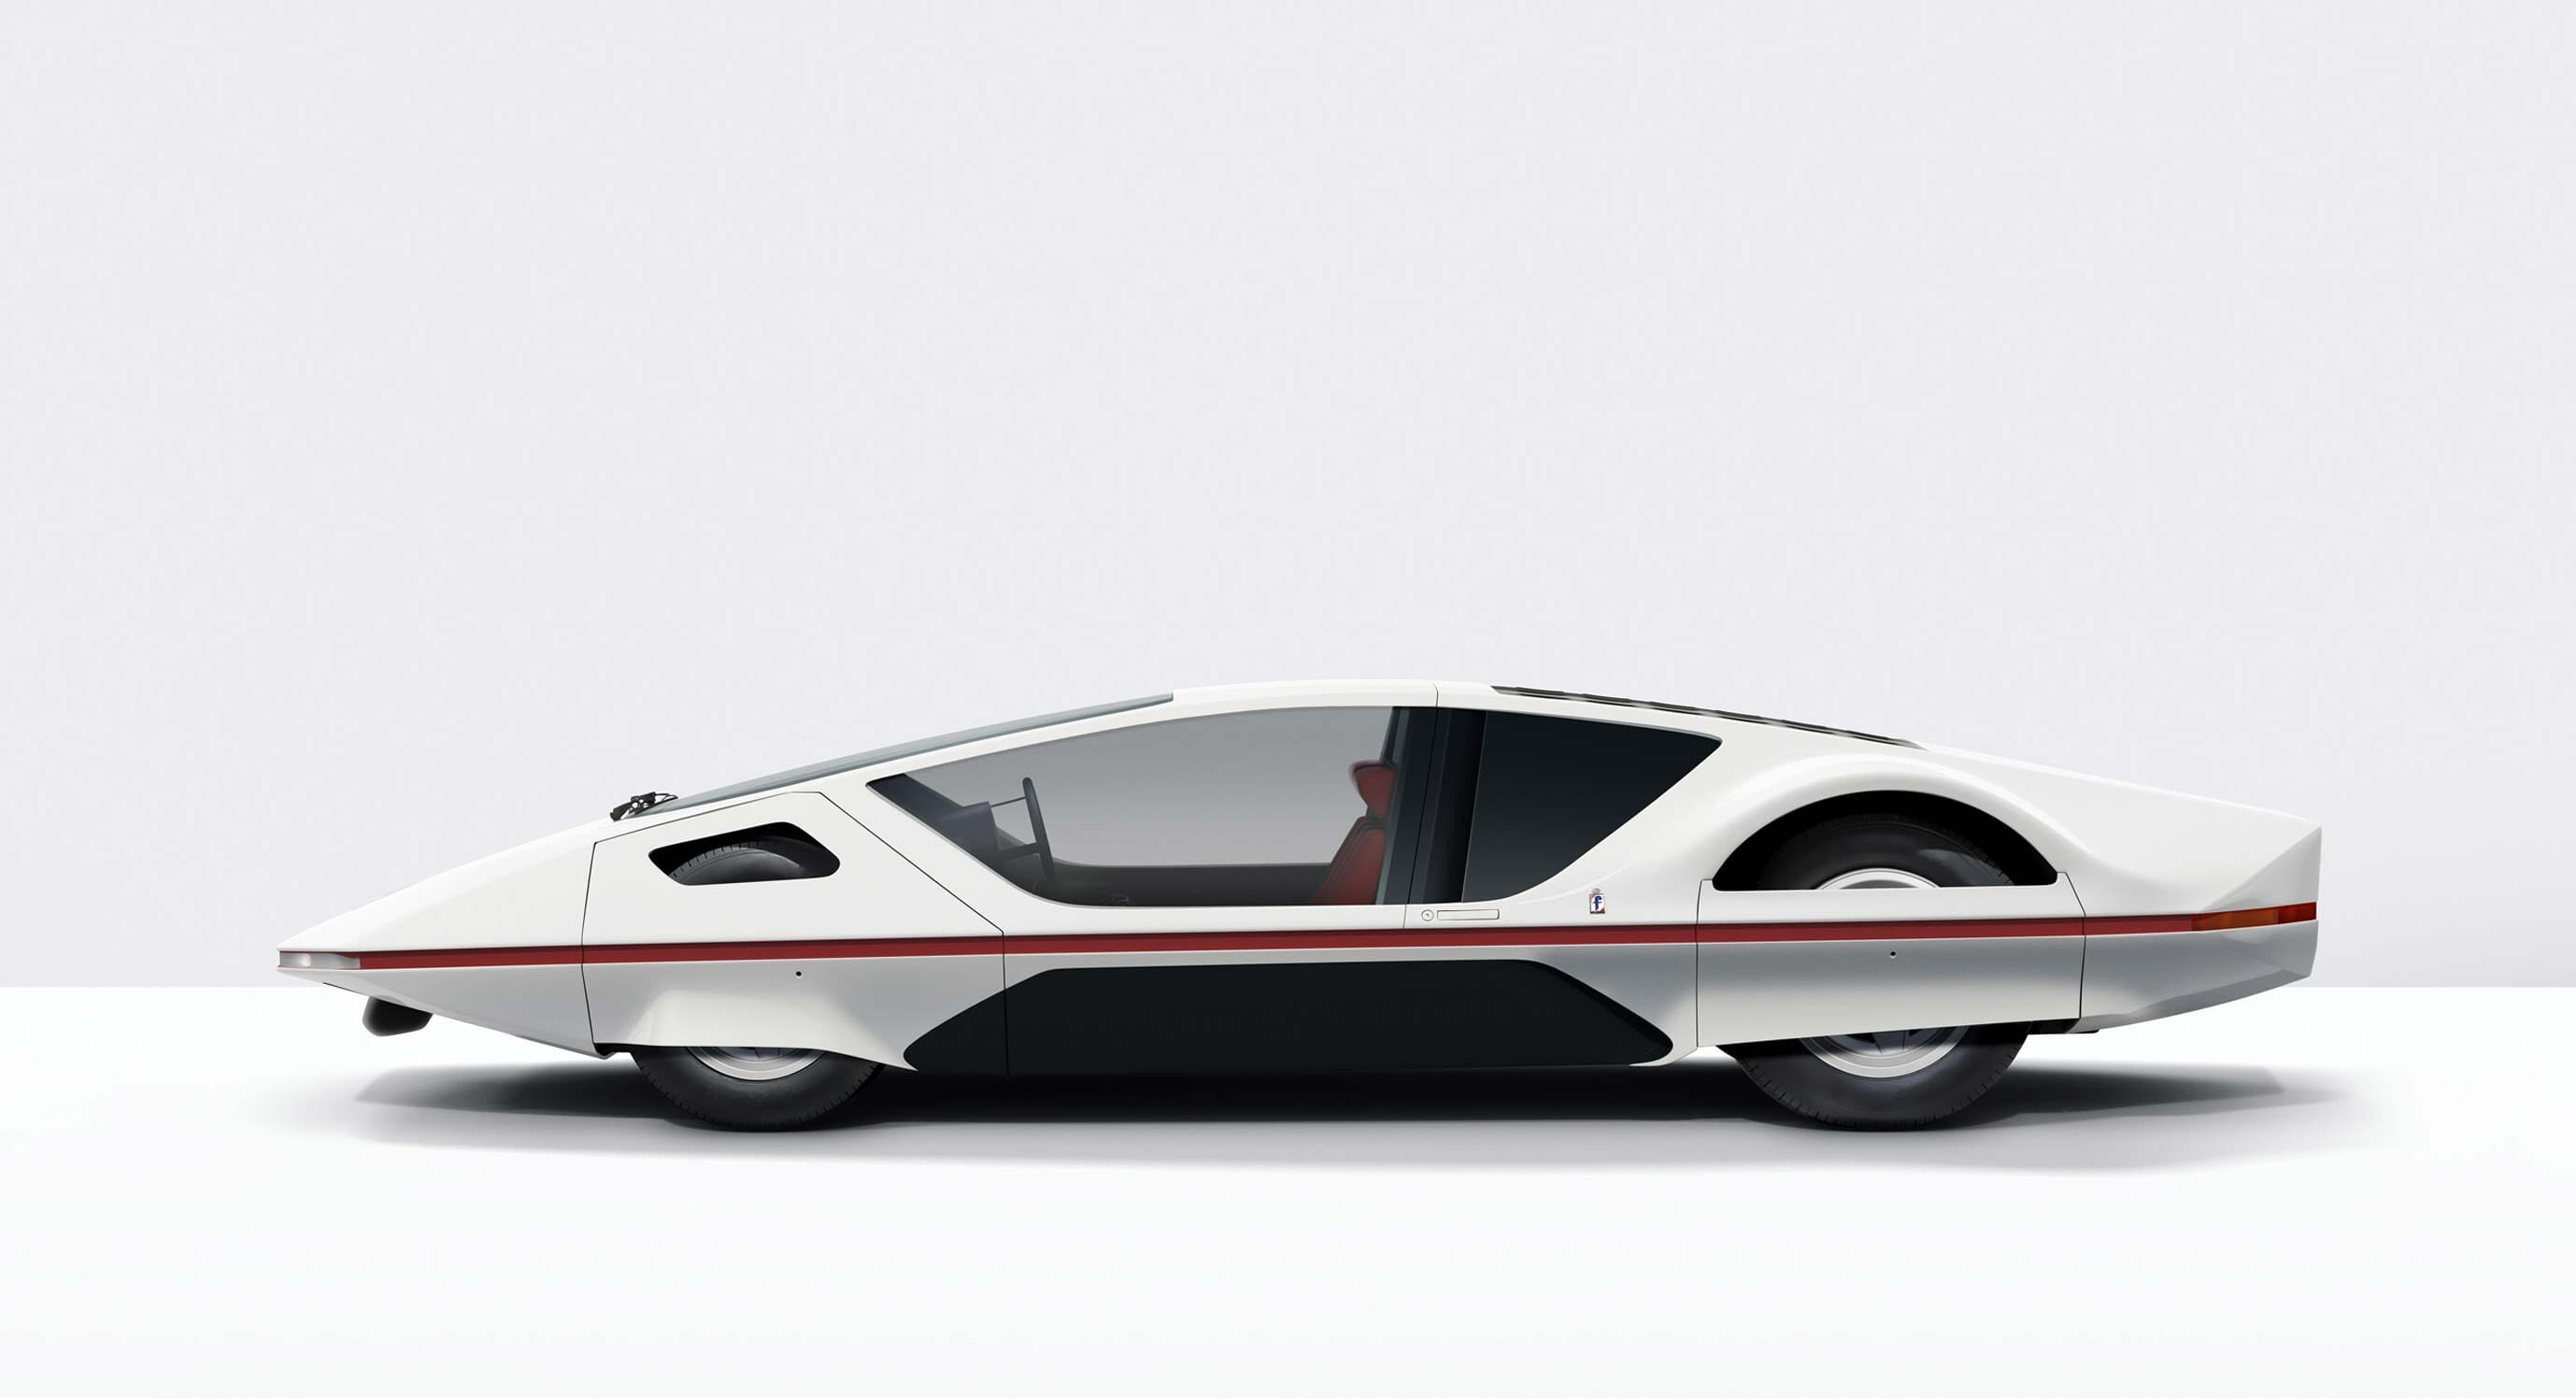 Docubyte's Wedged Wonders Celebrates Futuristic Concept Cars